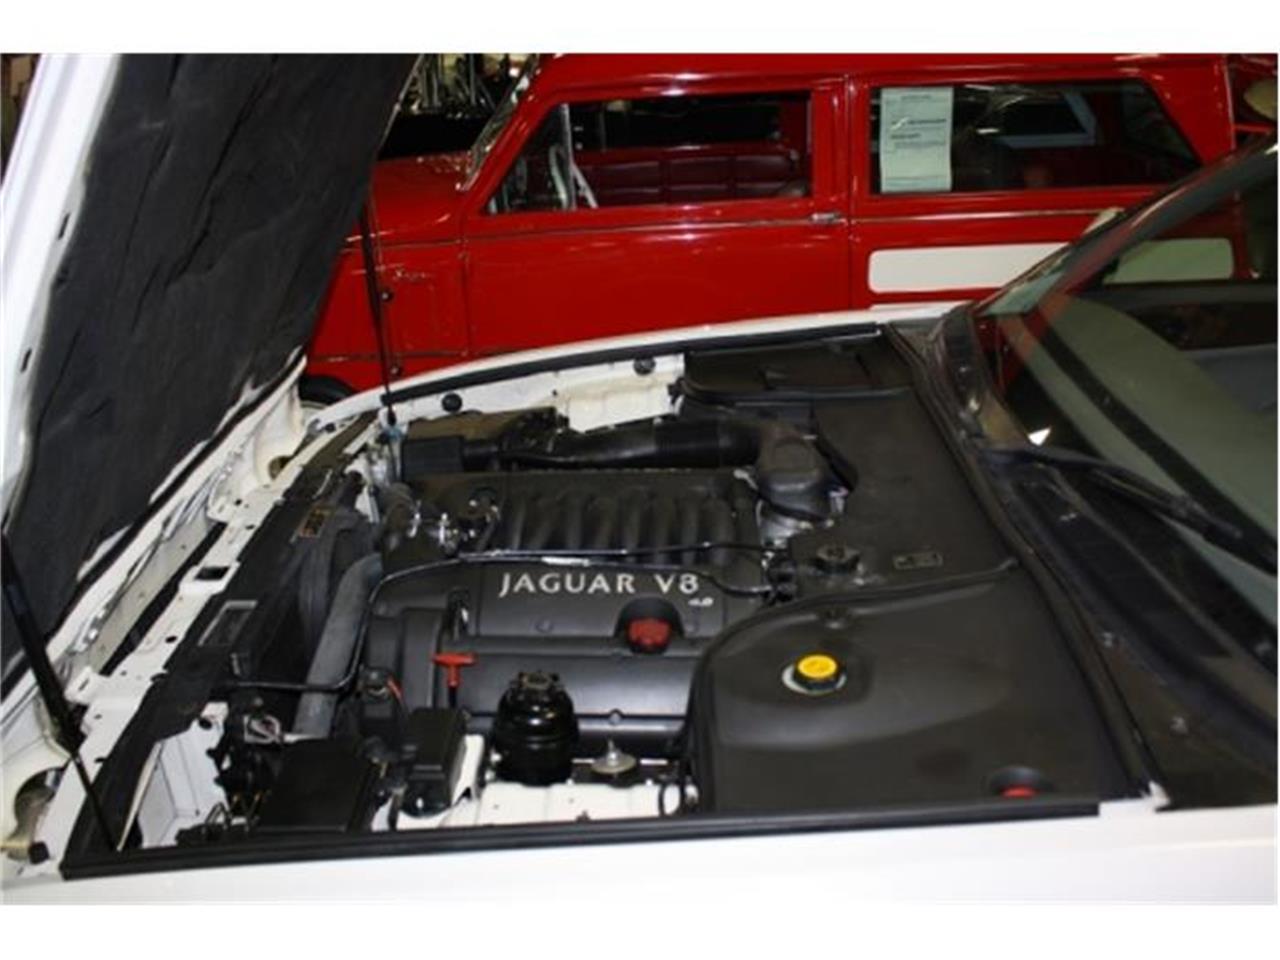 Large Picture of 2001 Jaguar XJ8 located in Missouri - $7,000.00 - DSCT